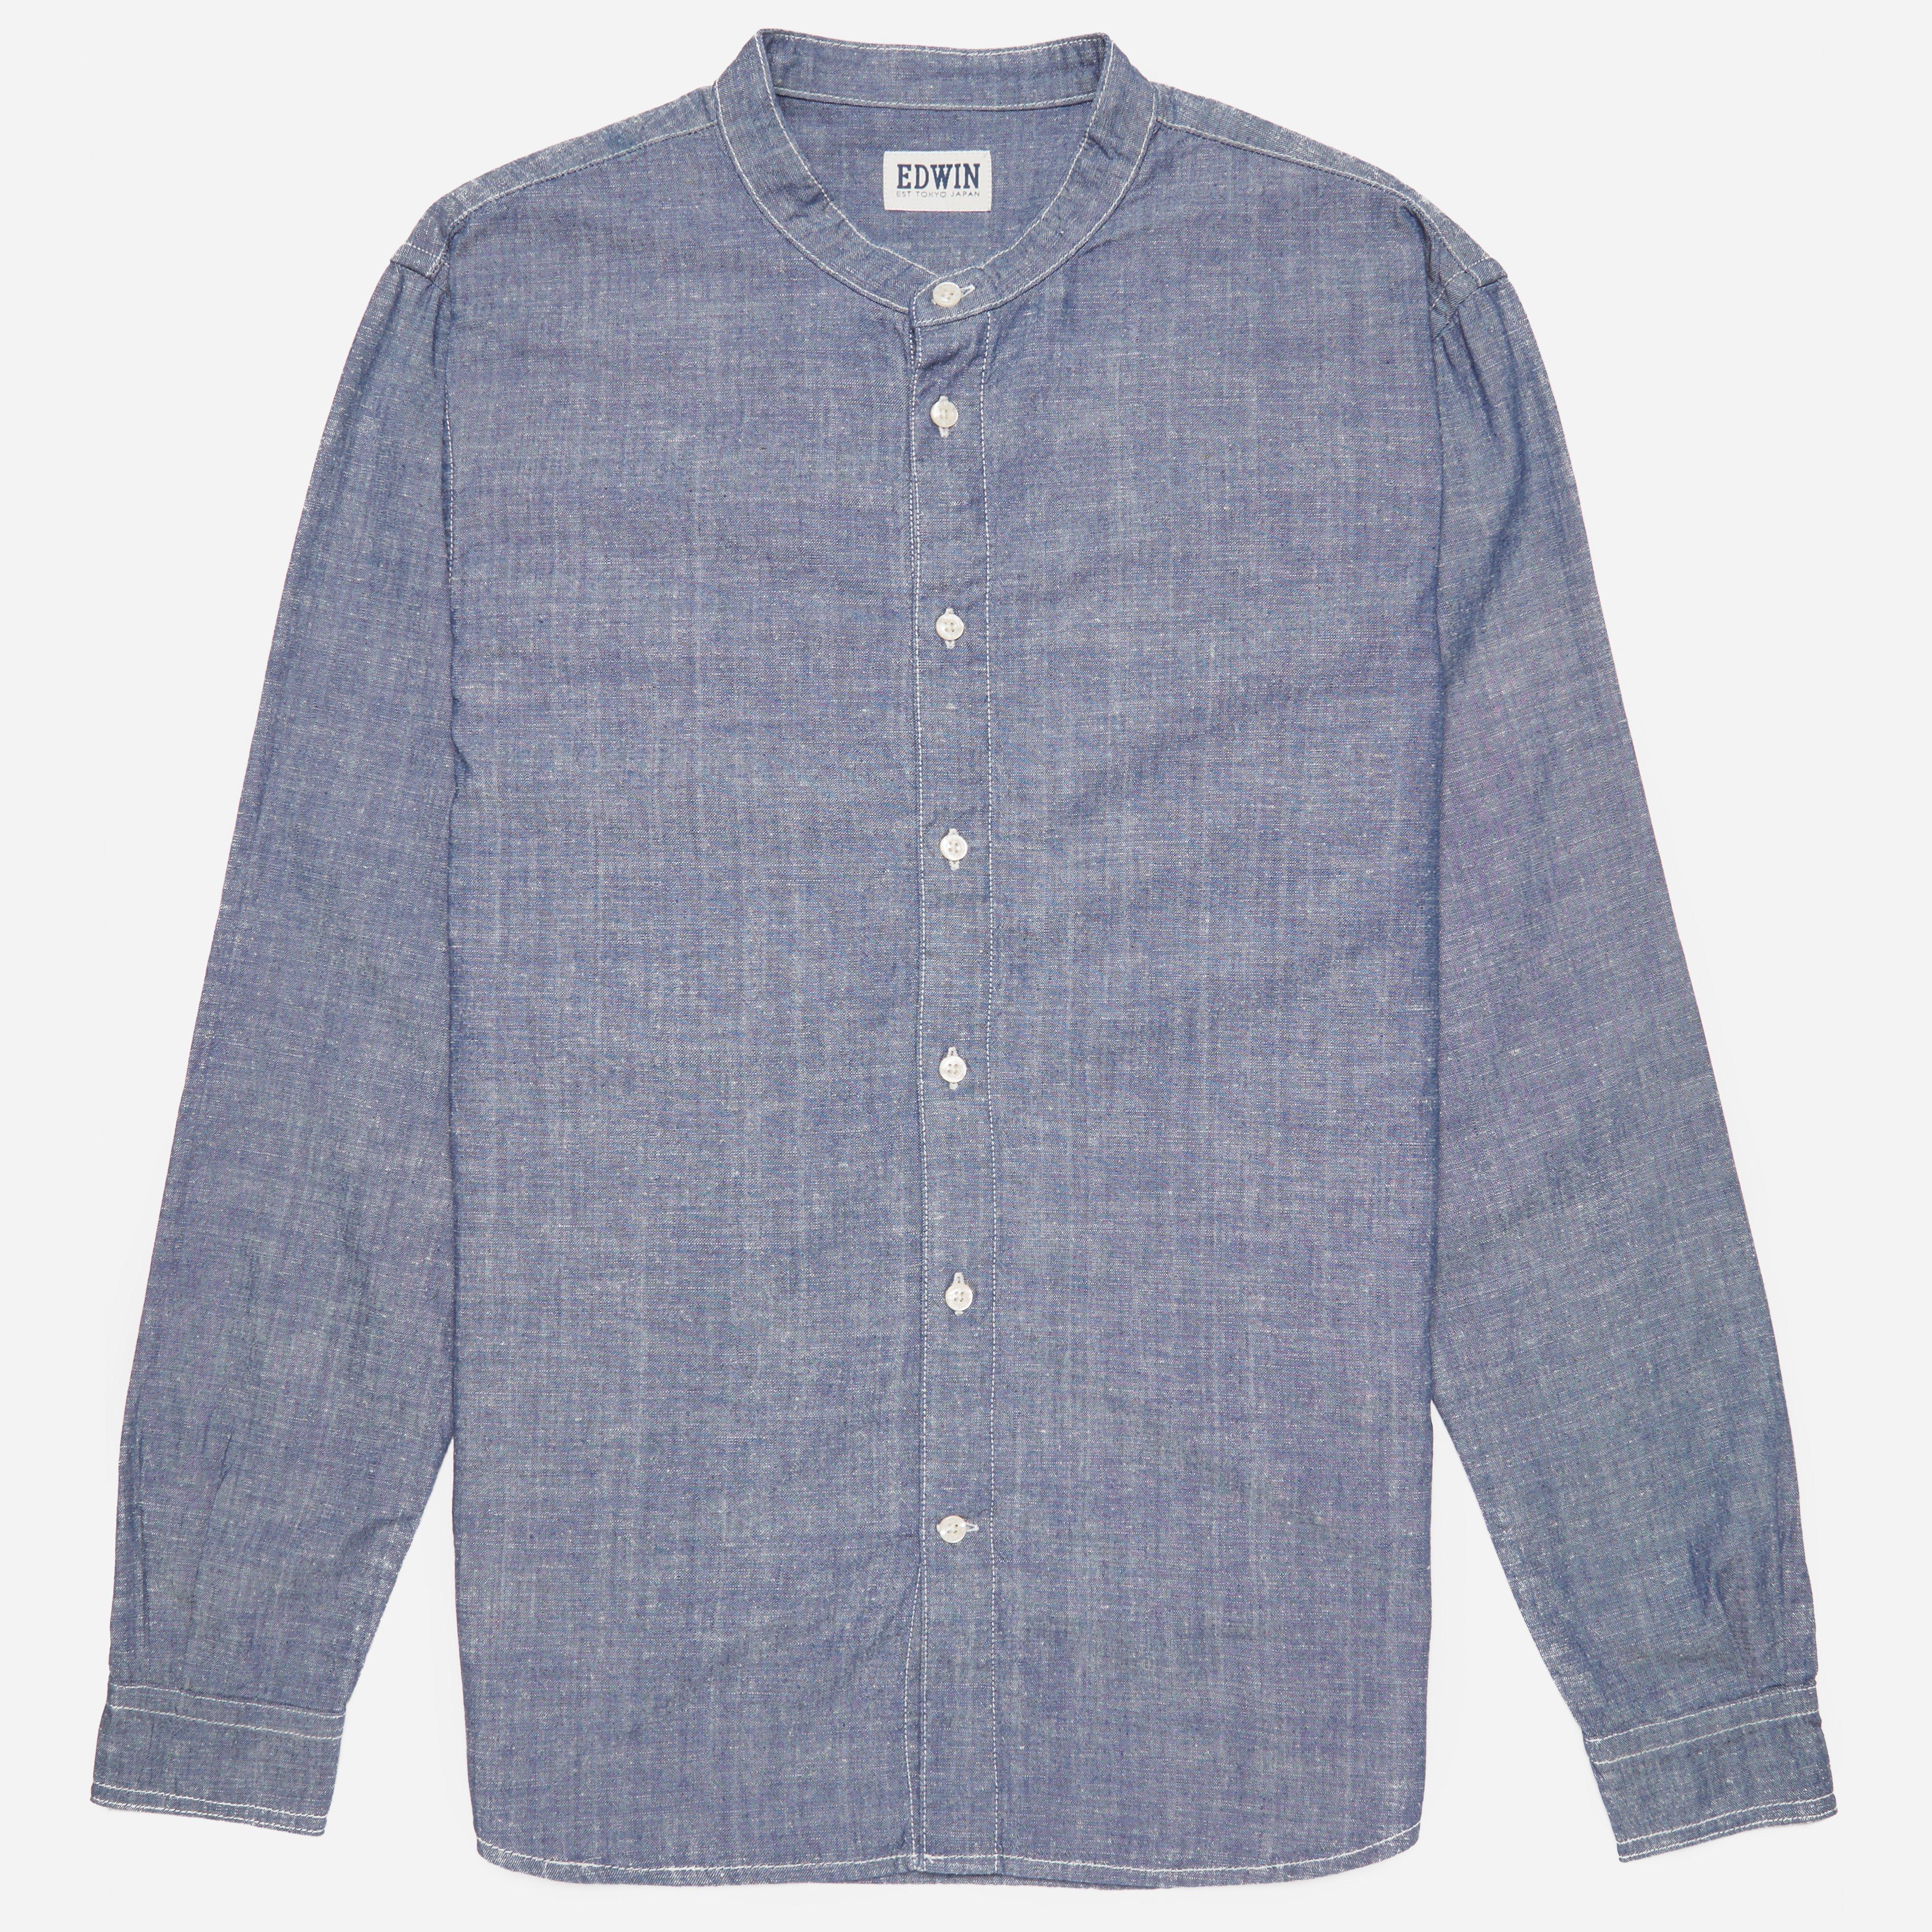 Edwin Plain Chambray Sailman Shirt